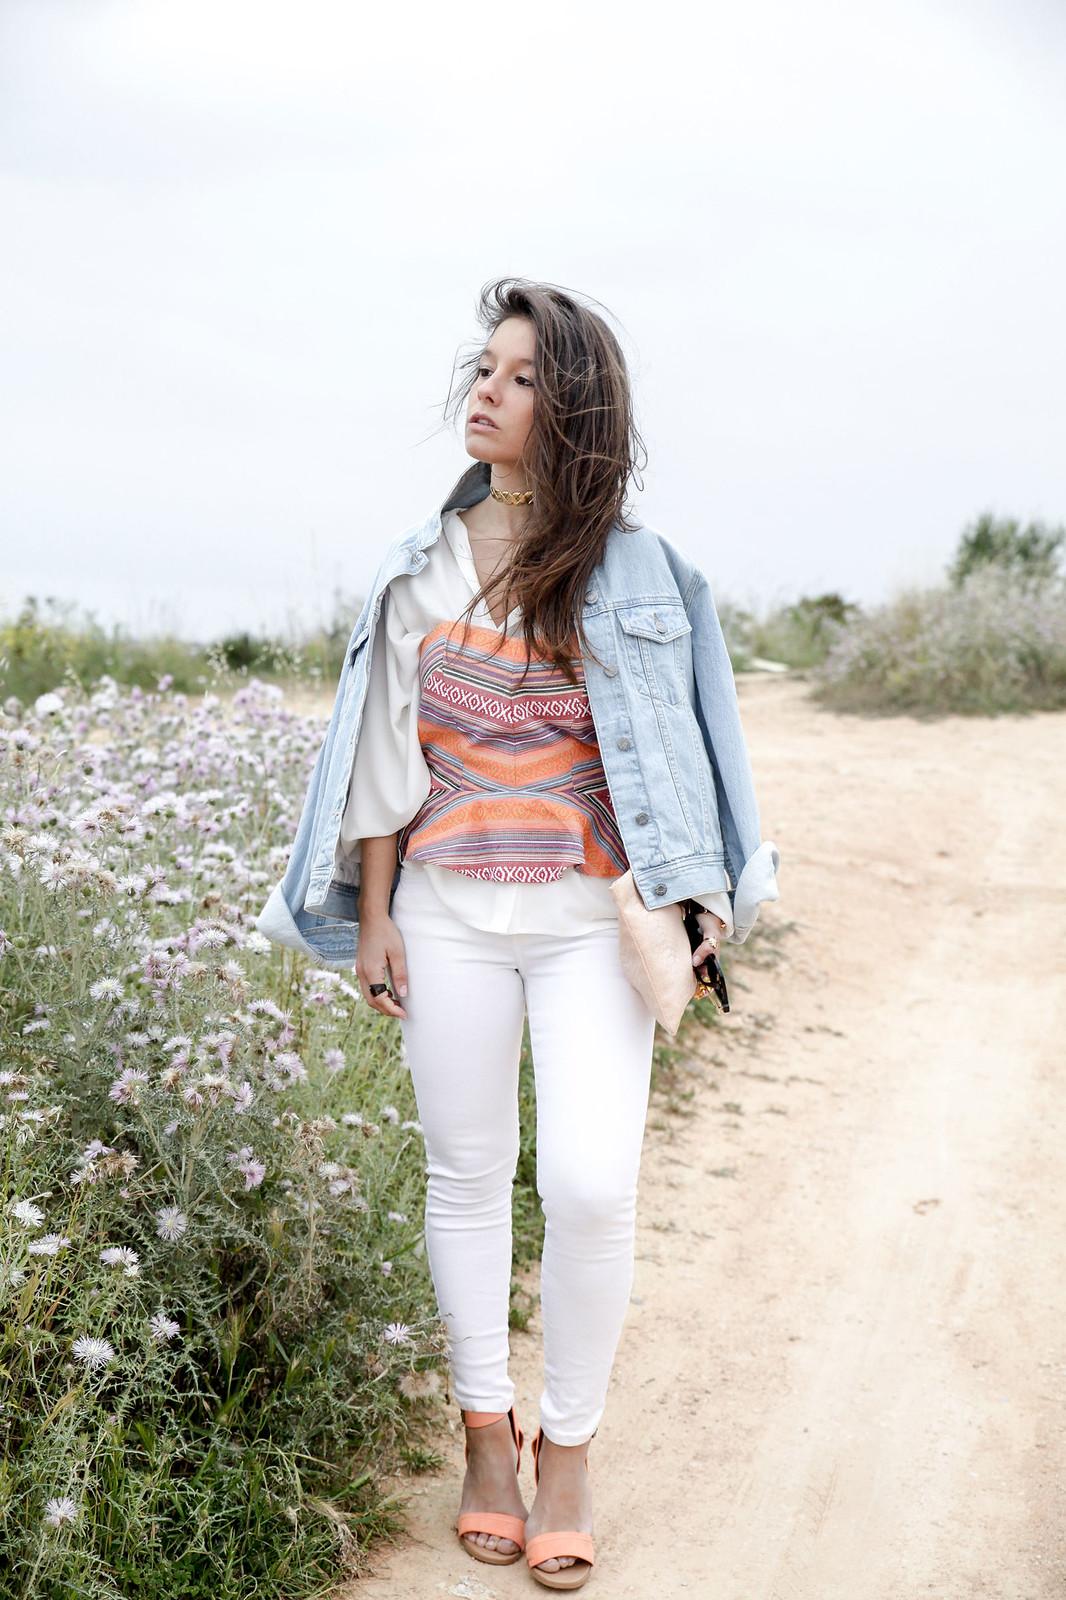 02_corset_etnico_danity_paris_theguestgirl_influencer_barcelona_laura_santolaria